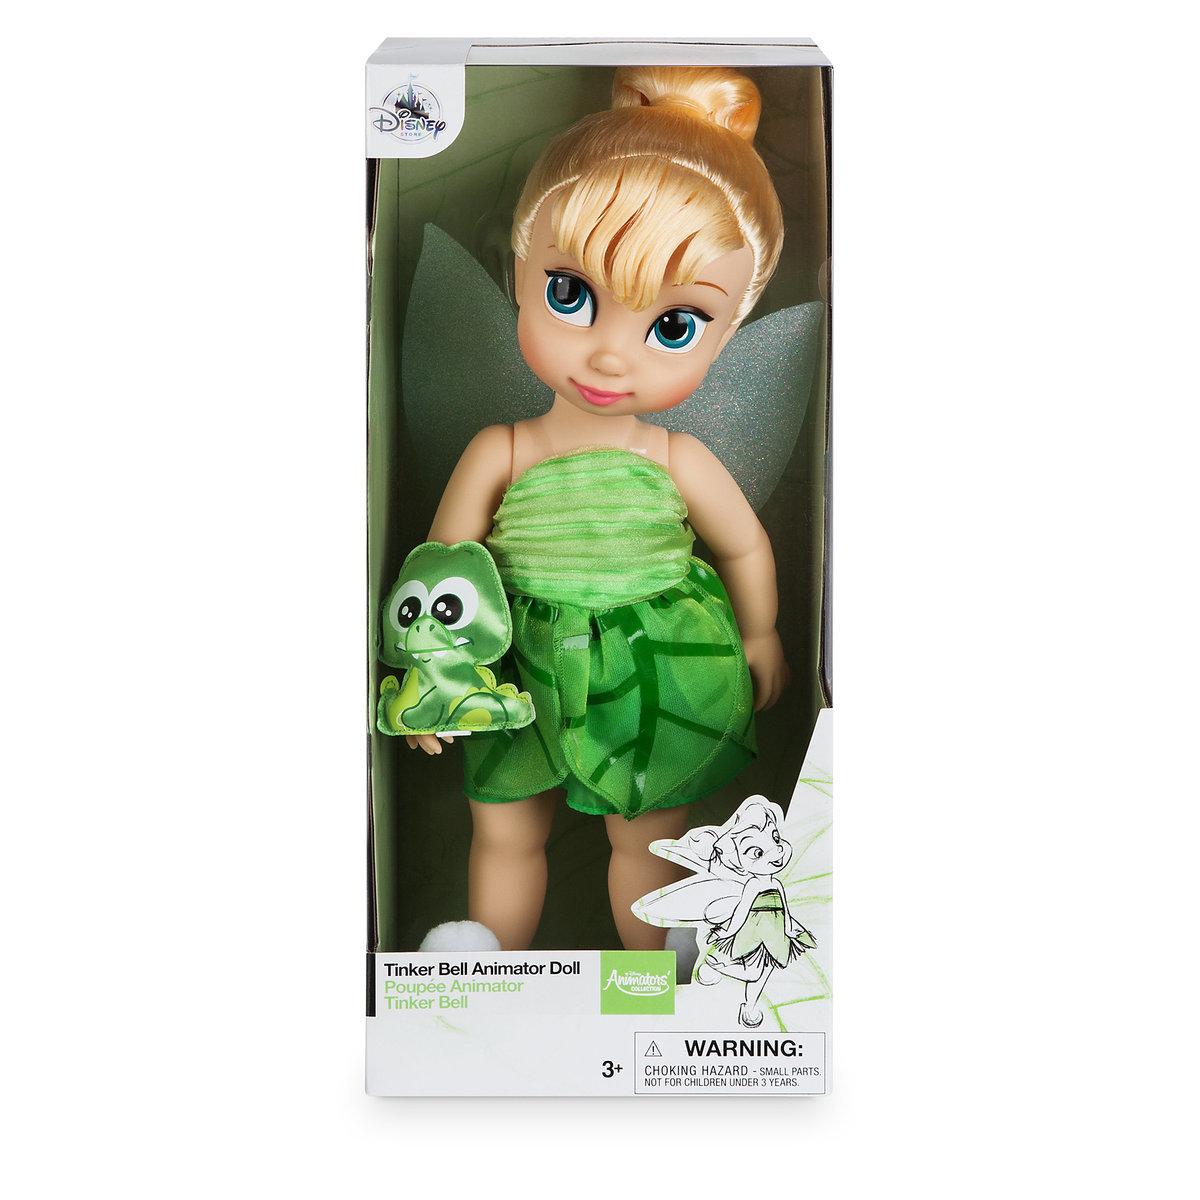 Disney Animators' Collection Tinker Bell Doll - 16'' ของแท้ นำเข้าจากอเมริกา